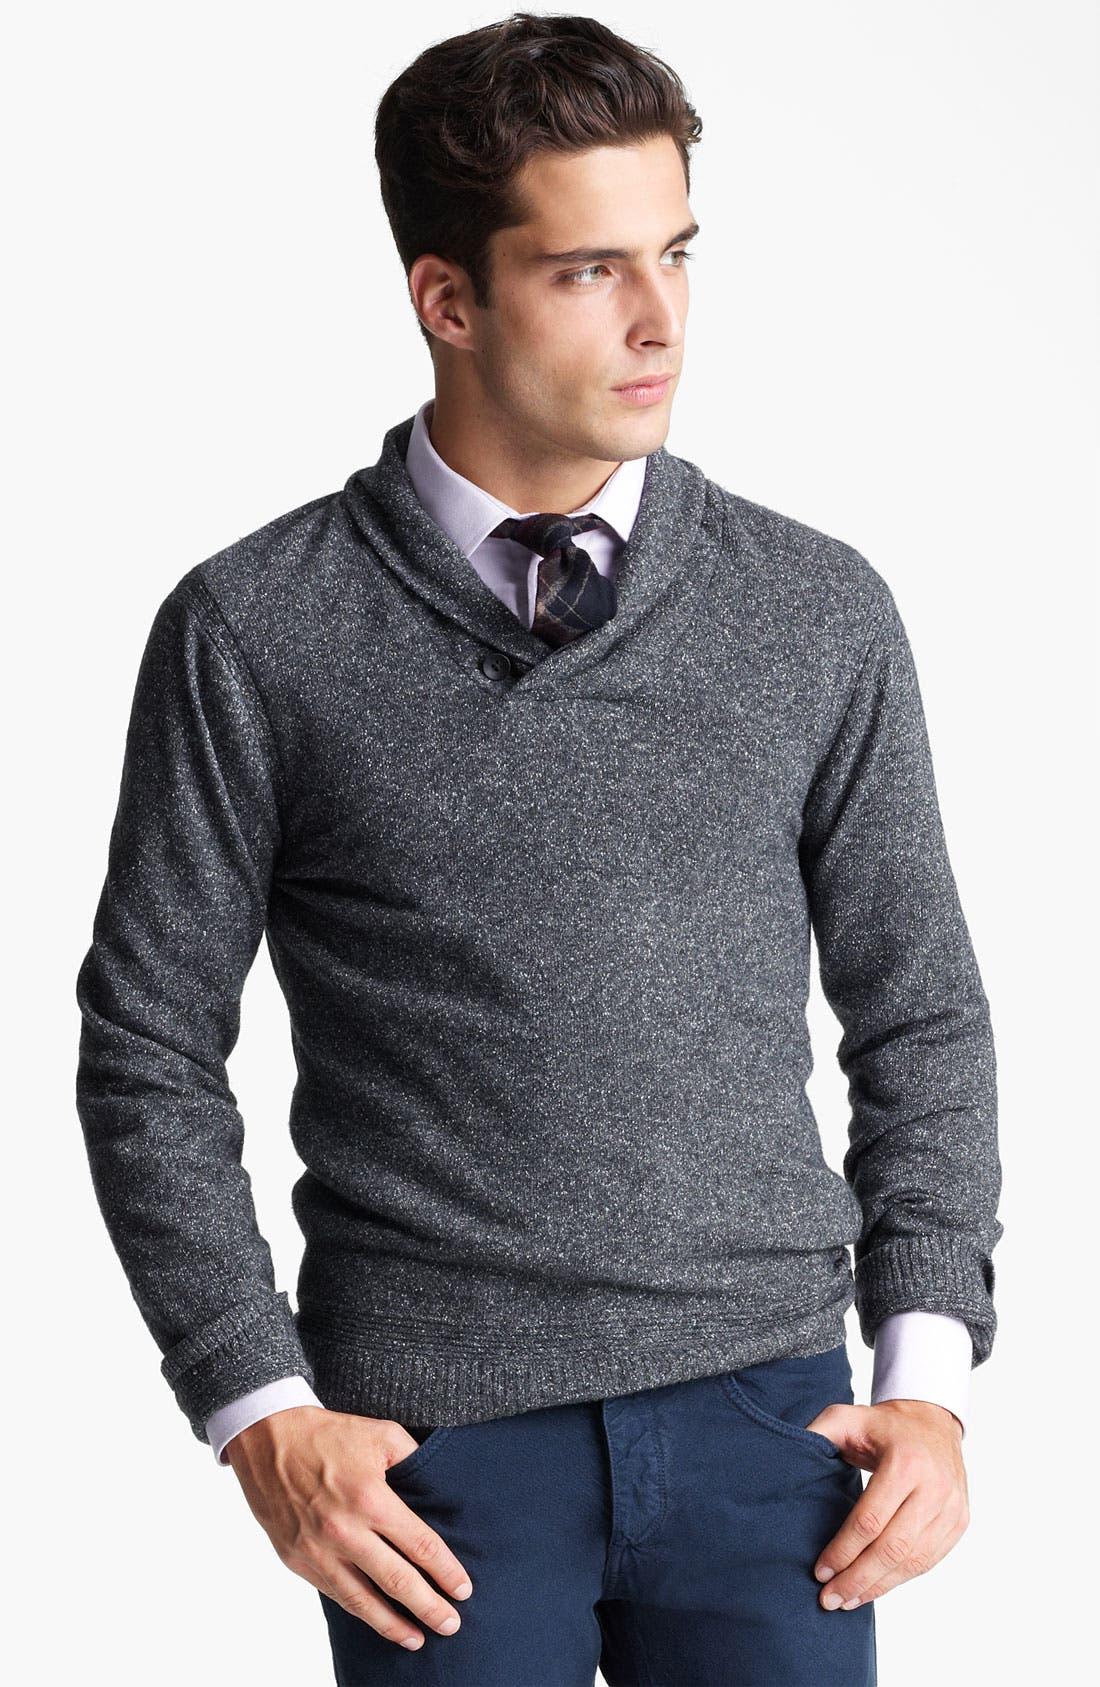 Alternate Image 1 Selected - rag & bone 'Hornberg' Shawl Collar Sweater